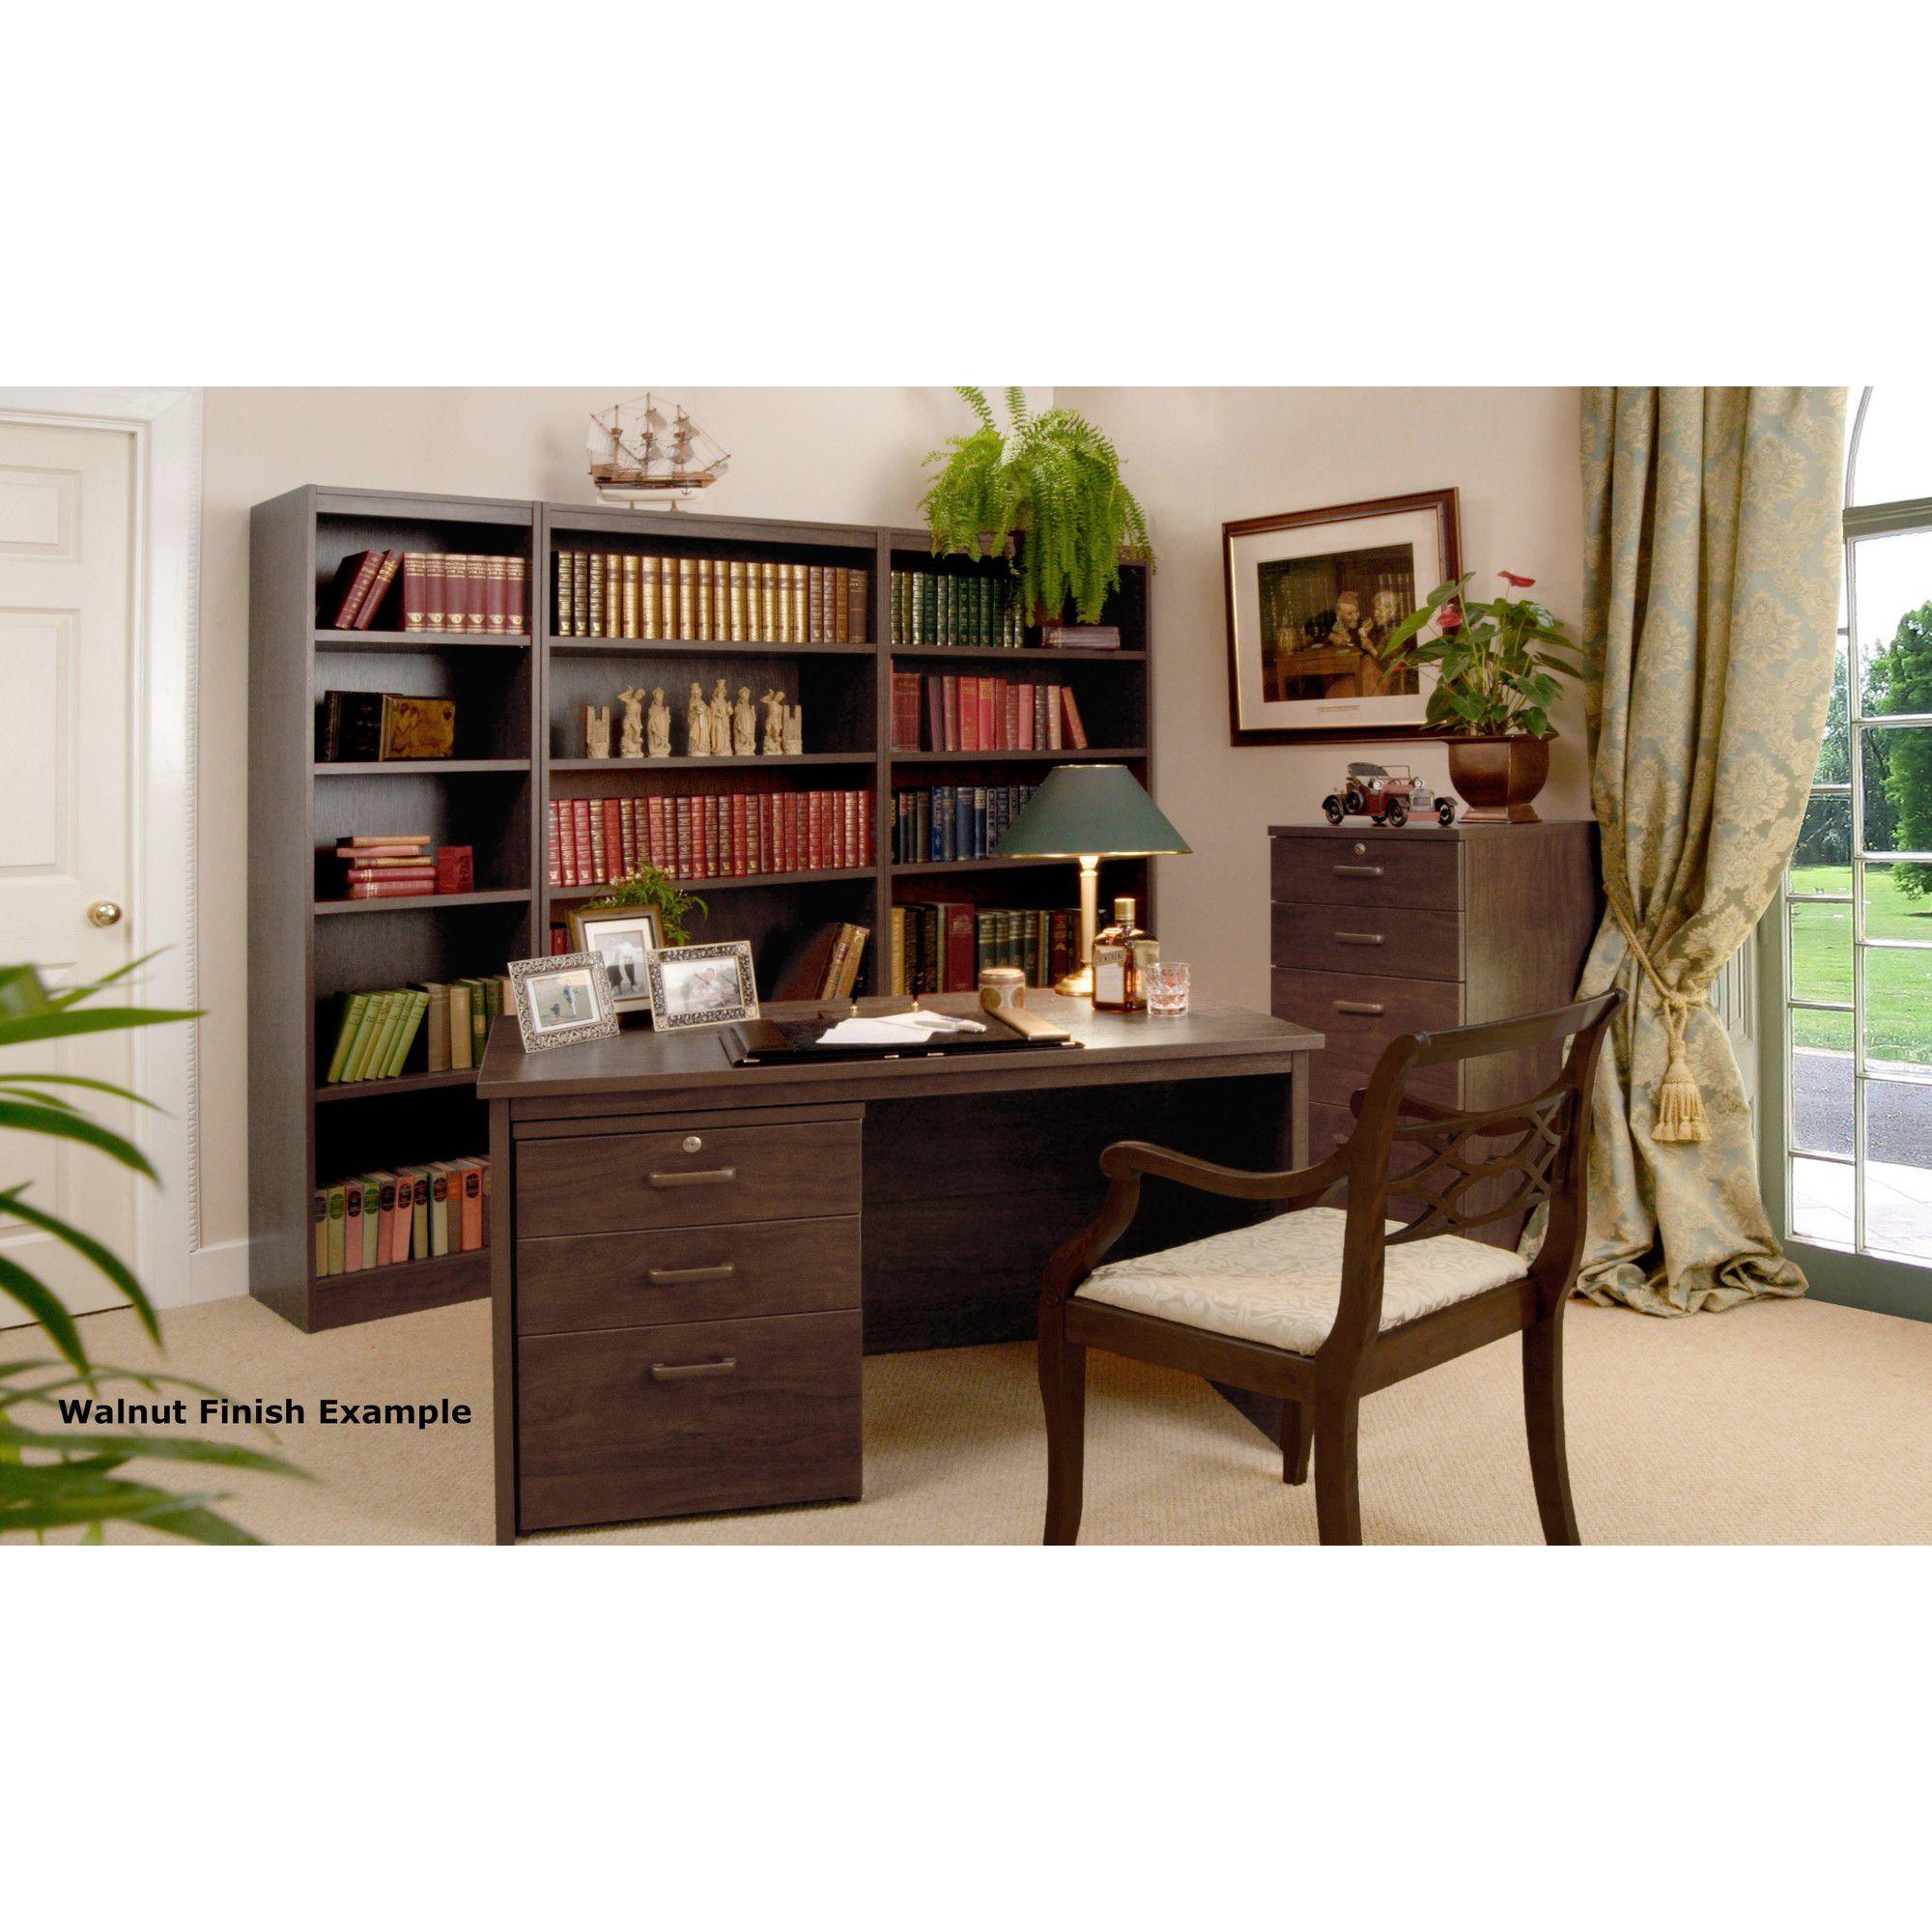 Enduro Four Drawer Tall Wooden Filing Cabinet - Teak at Tesco Direct